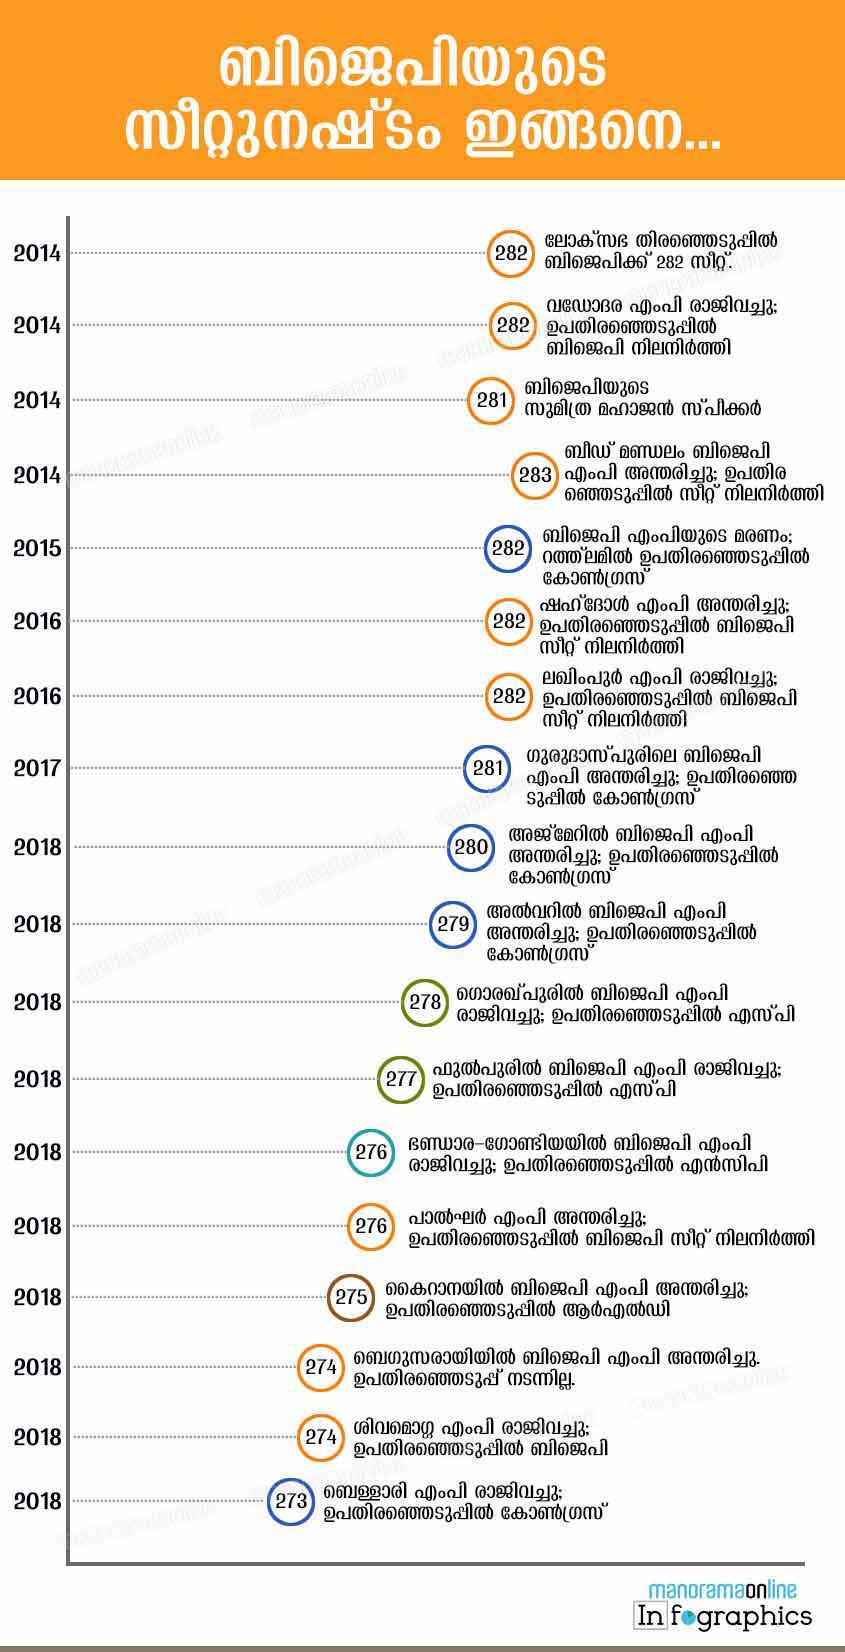 bjp-lost-seats-2014-to-2019-bypolls